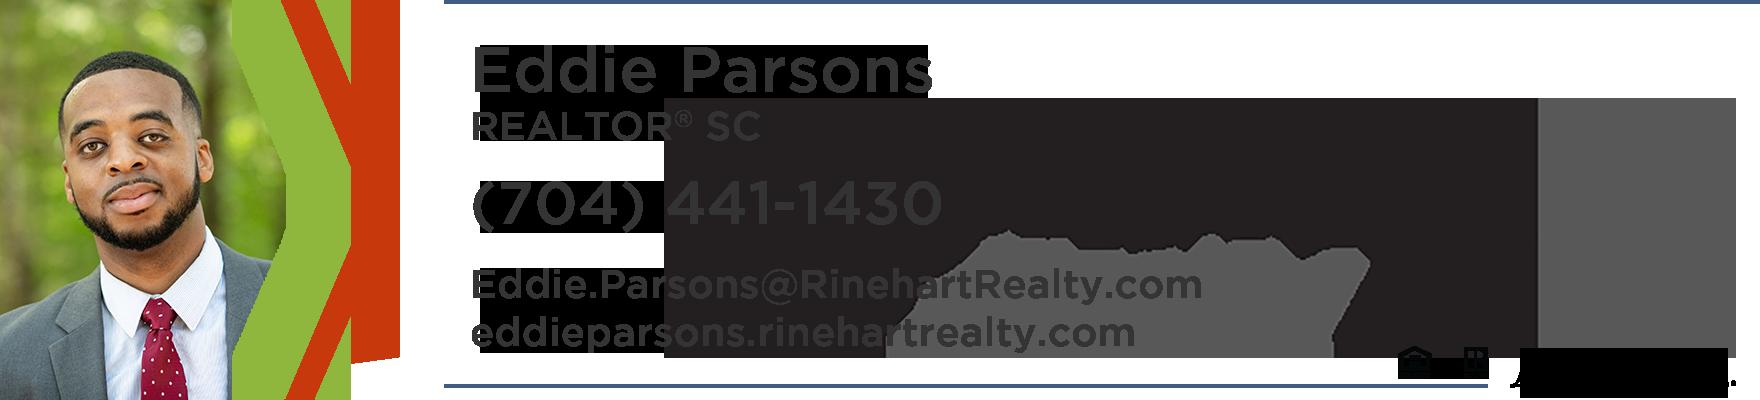 Eddie Parsons REALTOR SC